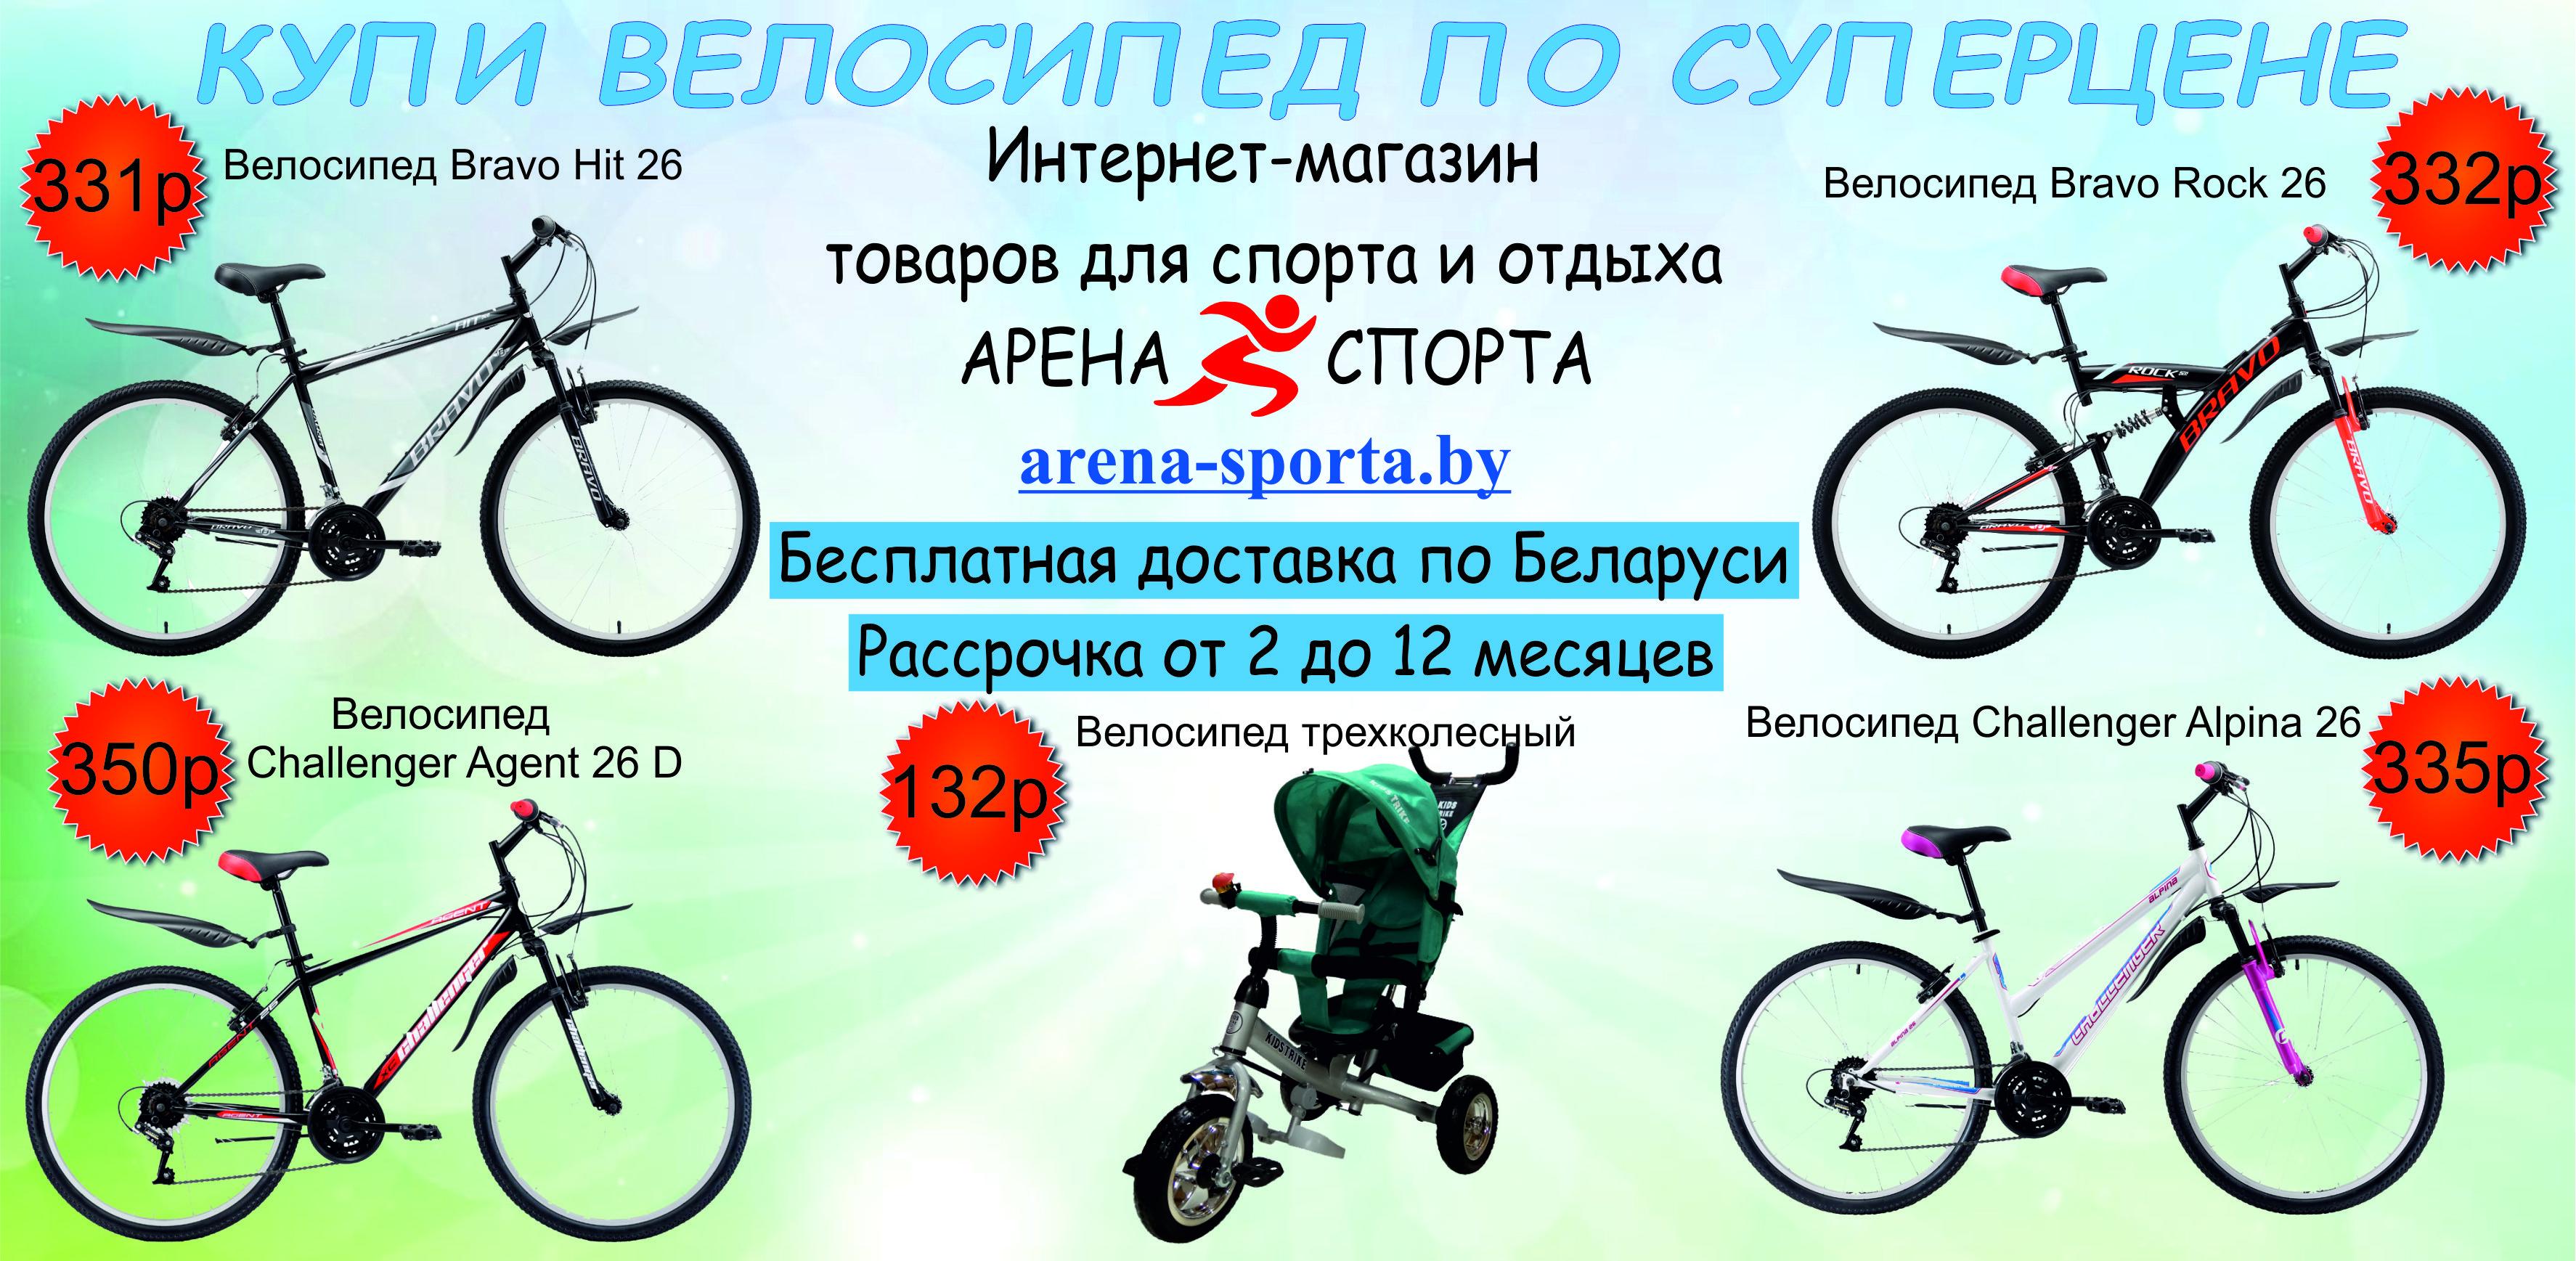 https://arena-sporta.by/catalog/velosipedy